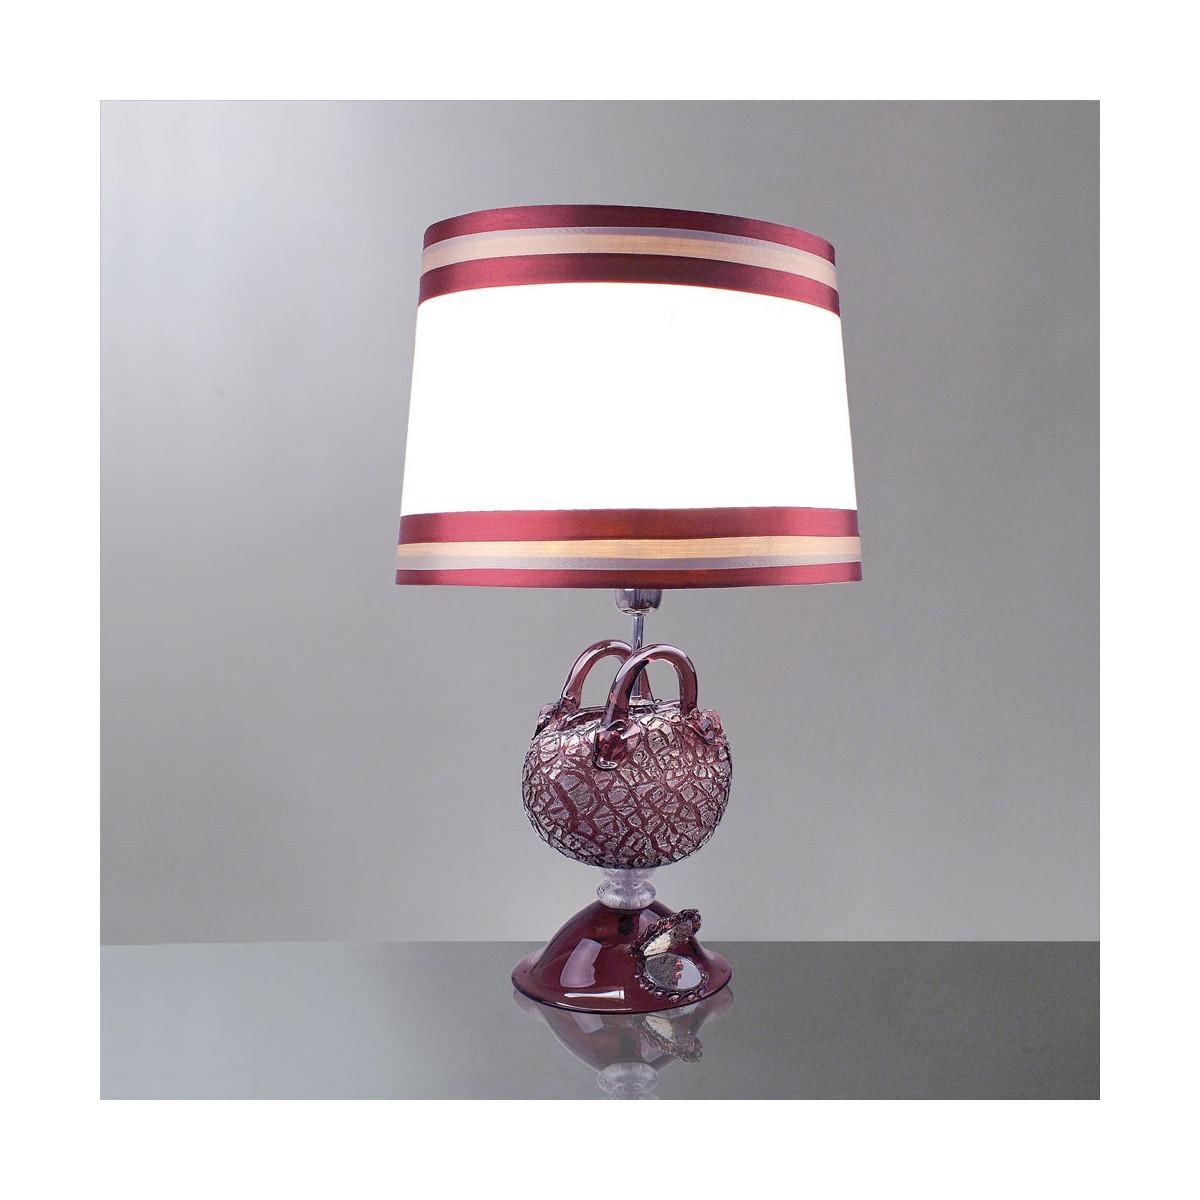 """Nefeli"" lampe de table en verre de Murano - 1 lumieres - amethyste et argent"